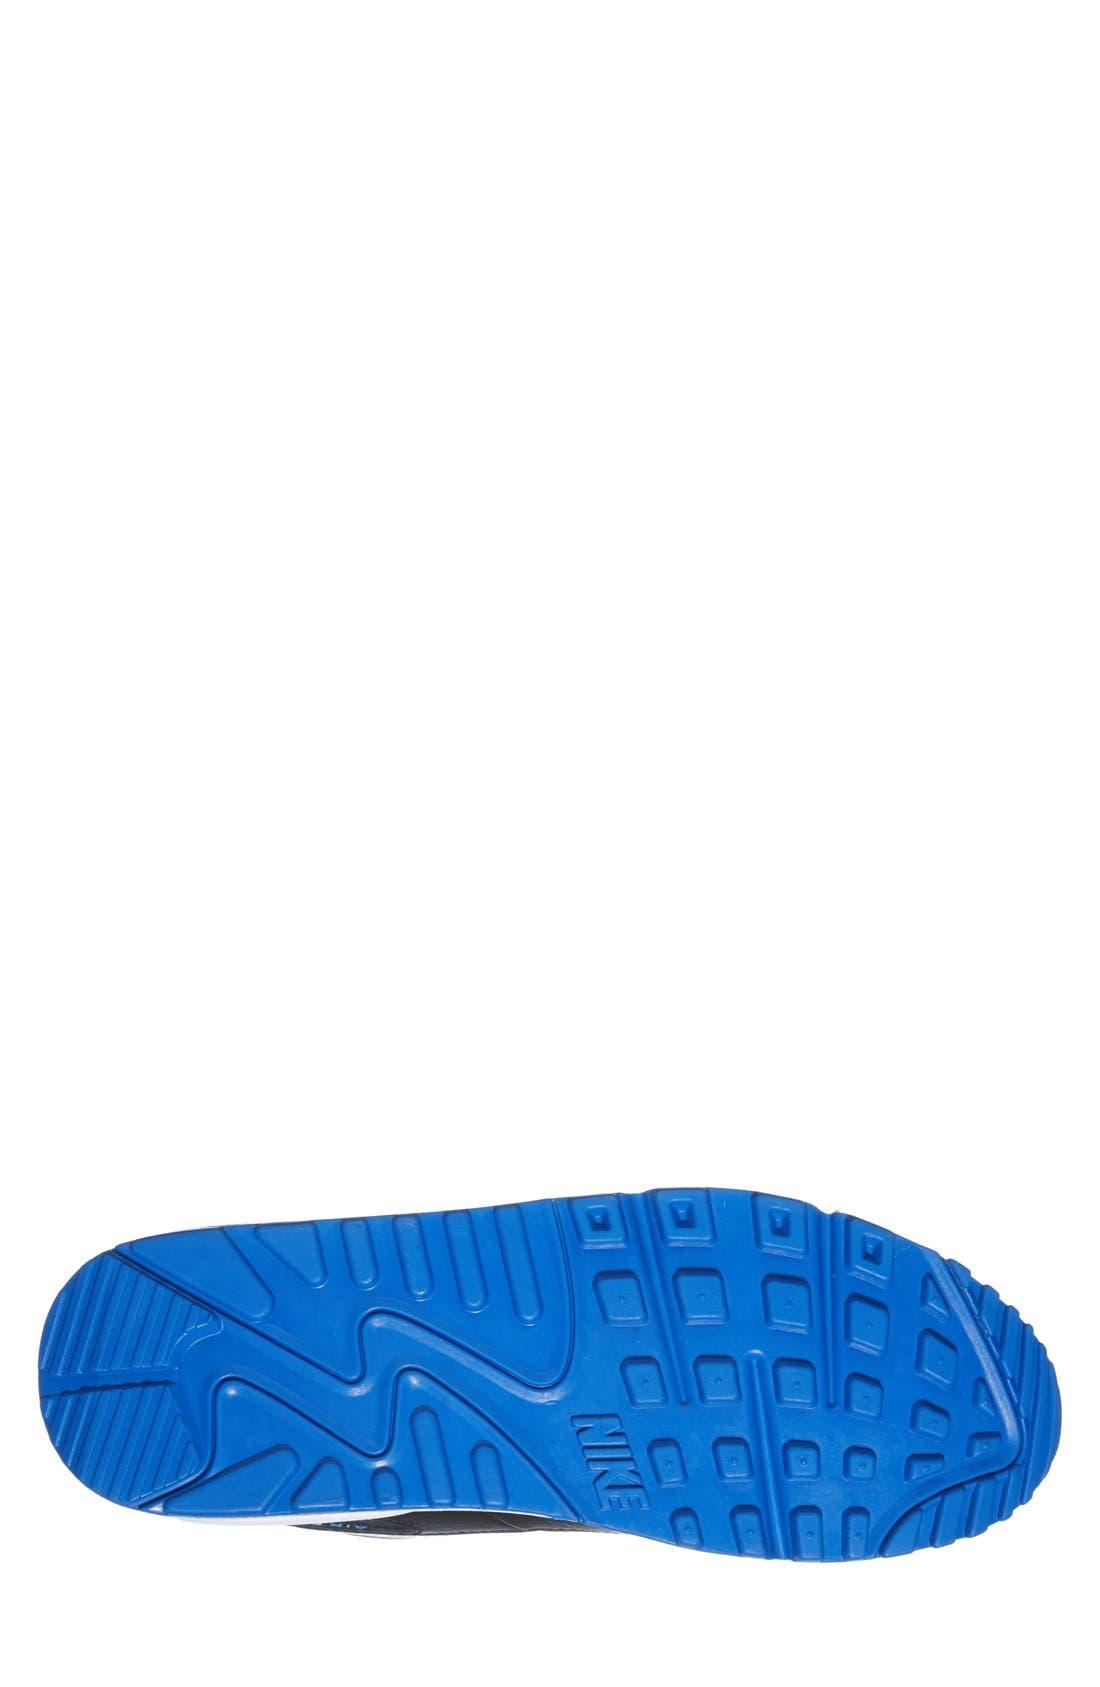 NIKE,                             'Air Max 90 LTR' Sneaker,                             Alternate thumbnail 2, color,                             001